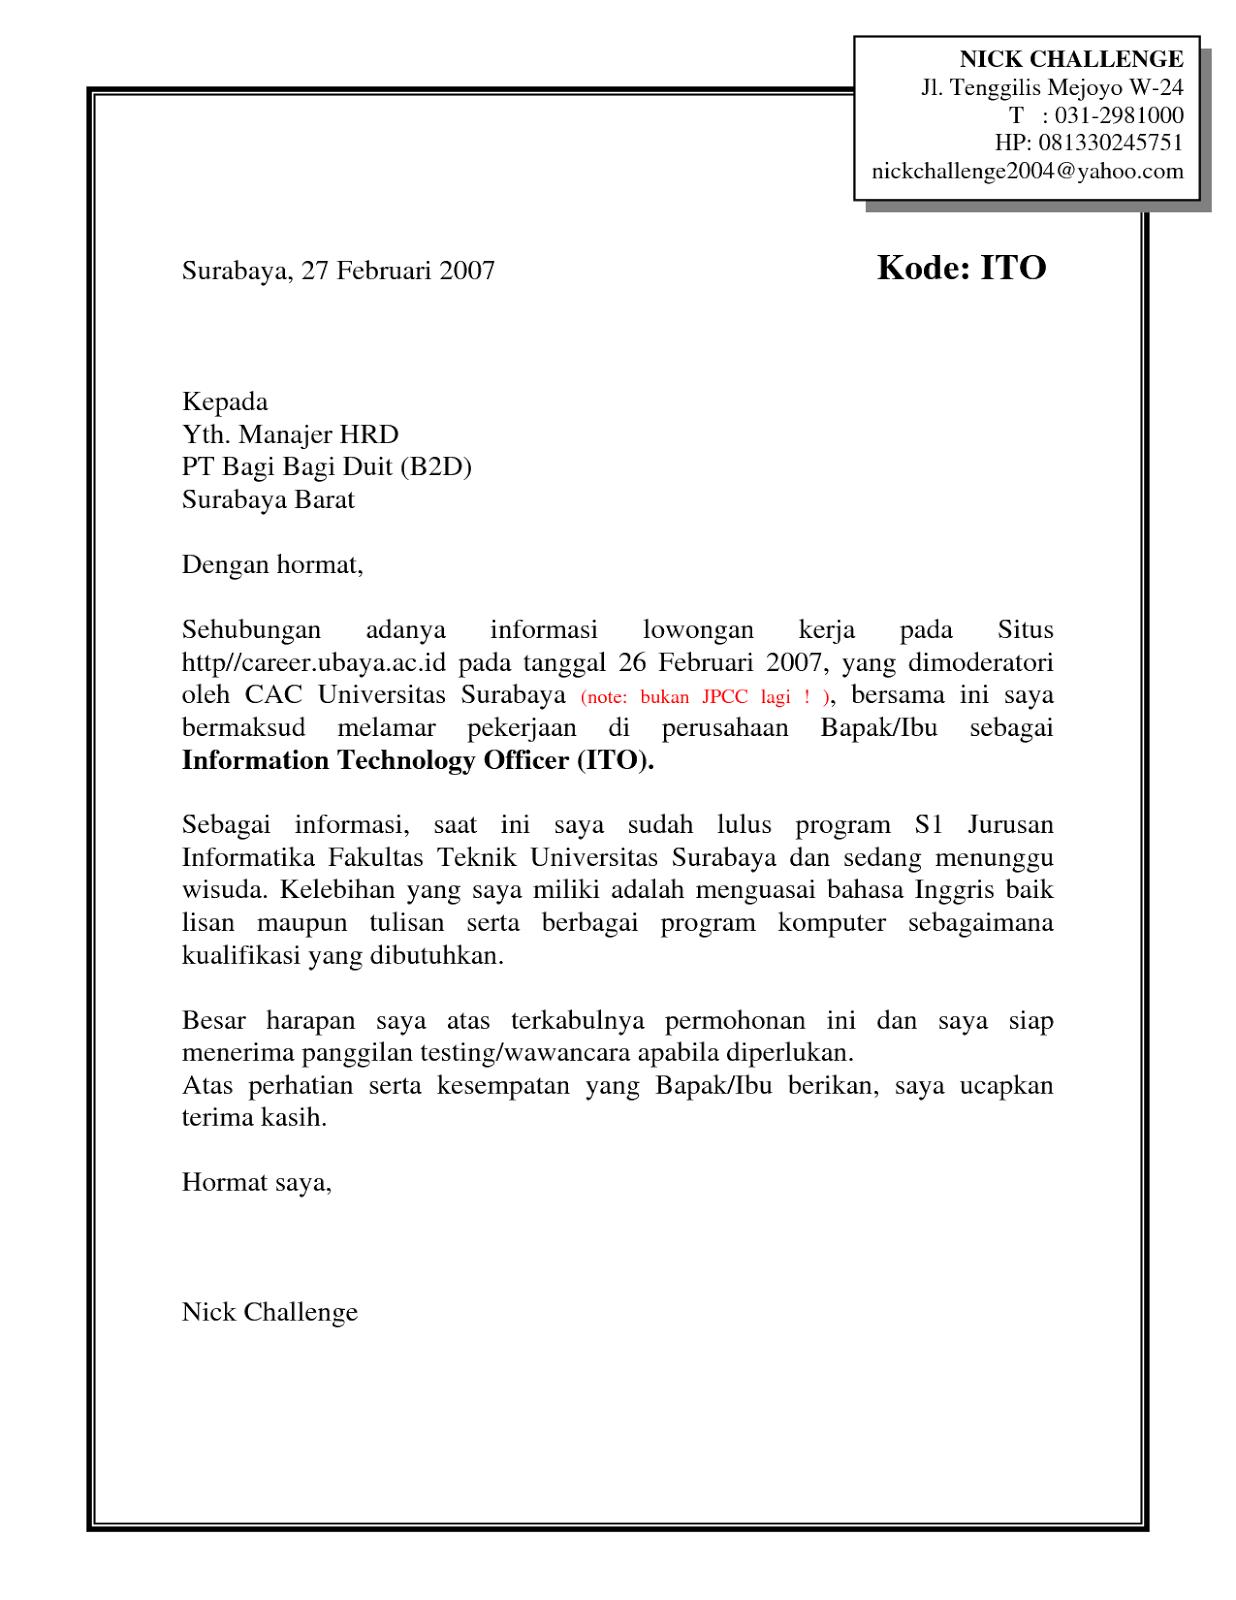 Contoh Surat Lamaran Kerja PDF - ben jobs